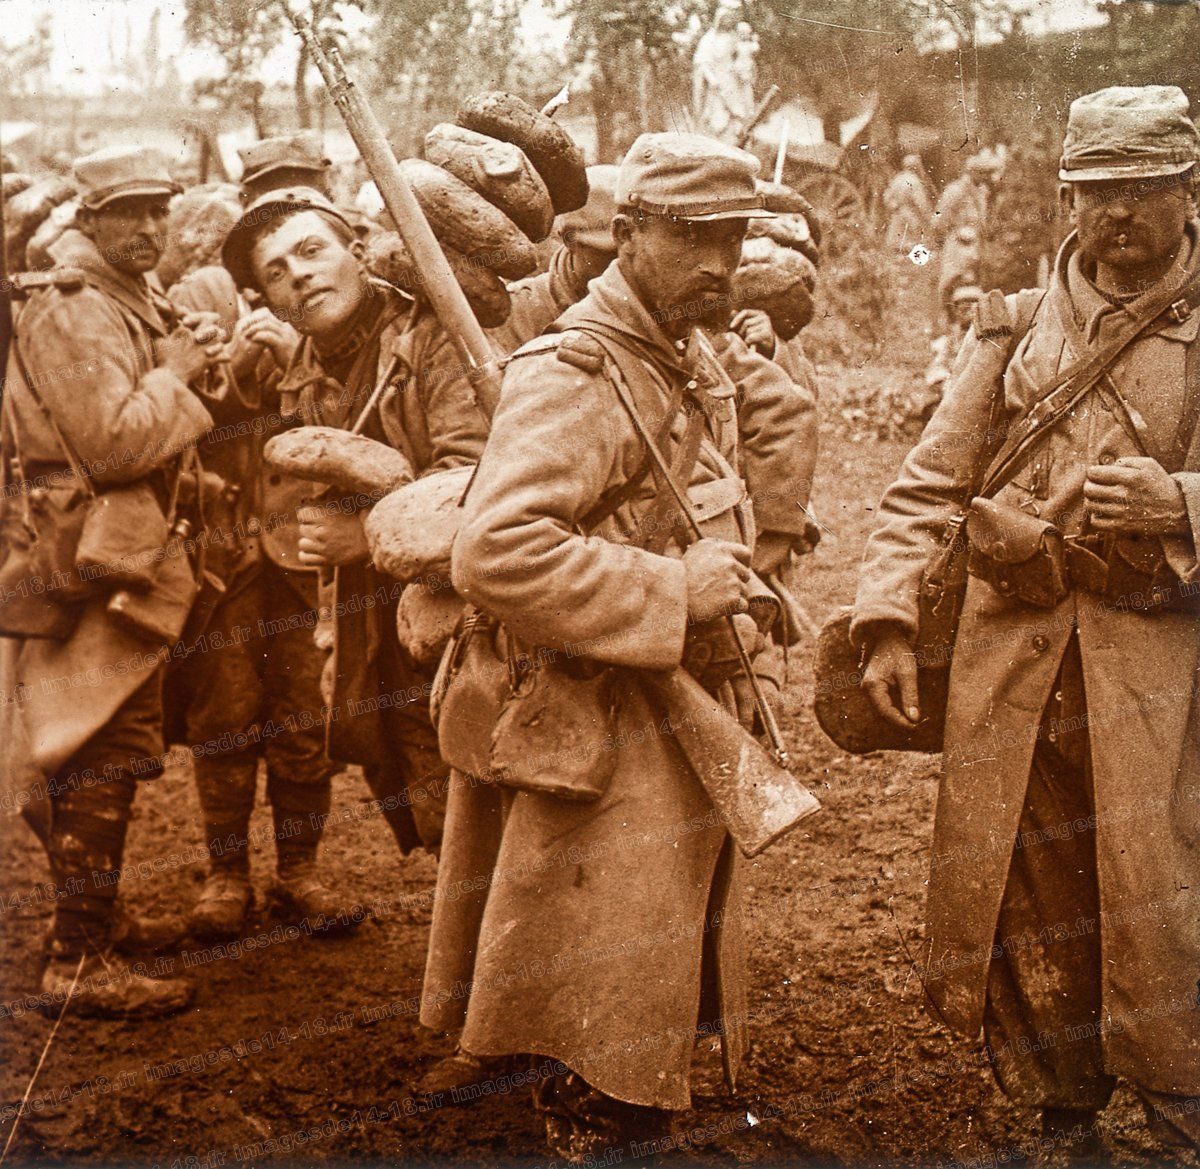 WWI; French soldiers return from a (bread) supply chore. - La PremièreGM, 14-18 (@1erGM) | Twitter